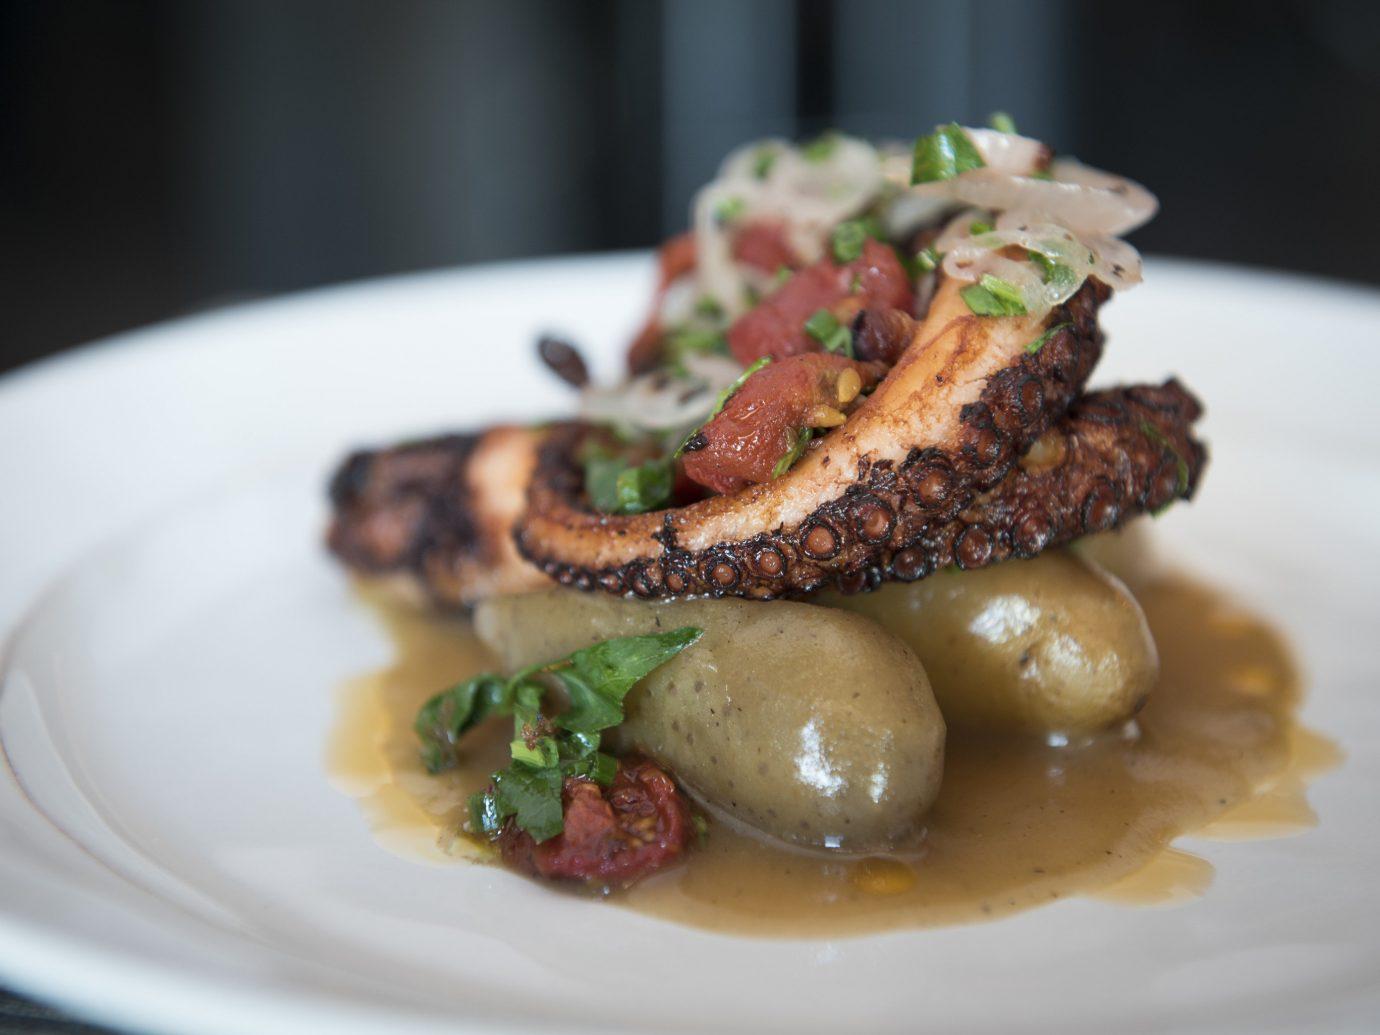 Travel Tips plate food dish white cuisine meal brunch appetizer meat dessert vegetable piece de resistance